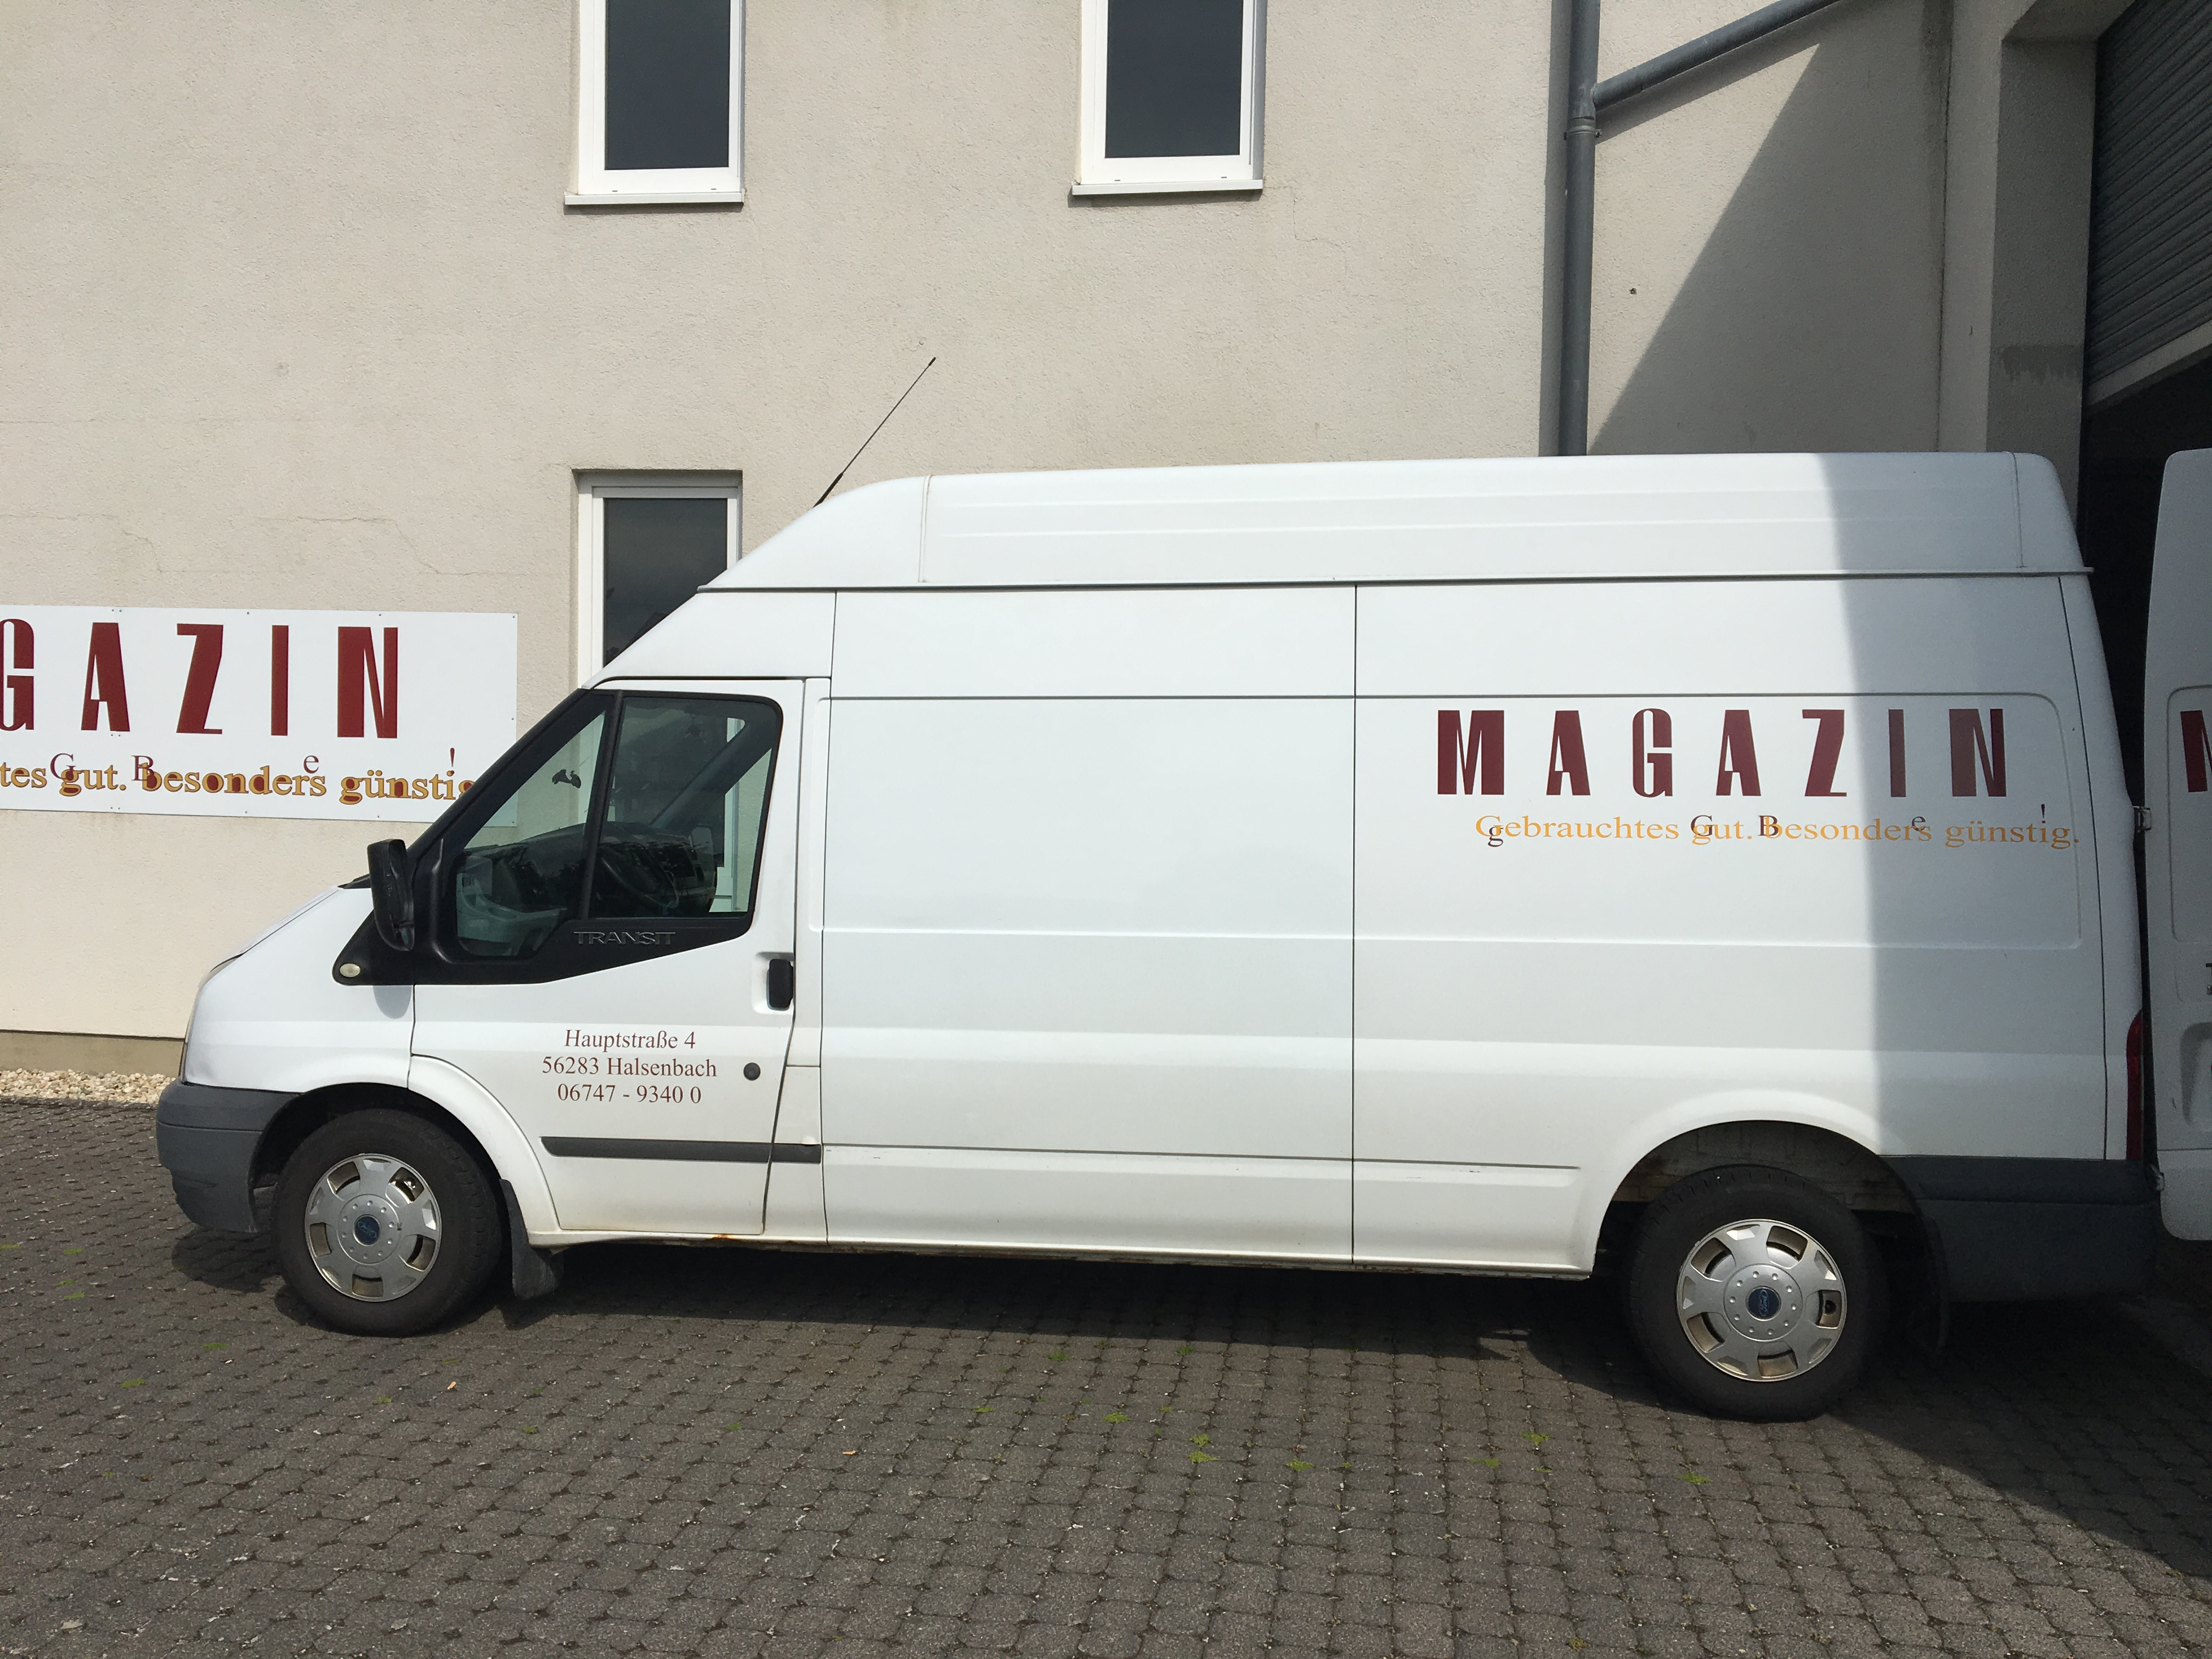 Möbelspende sachspende abholen in Koblenz Simmern Emmelshausen